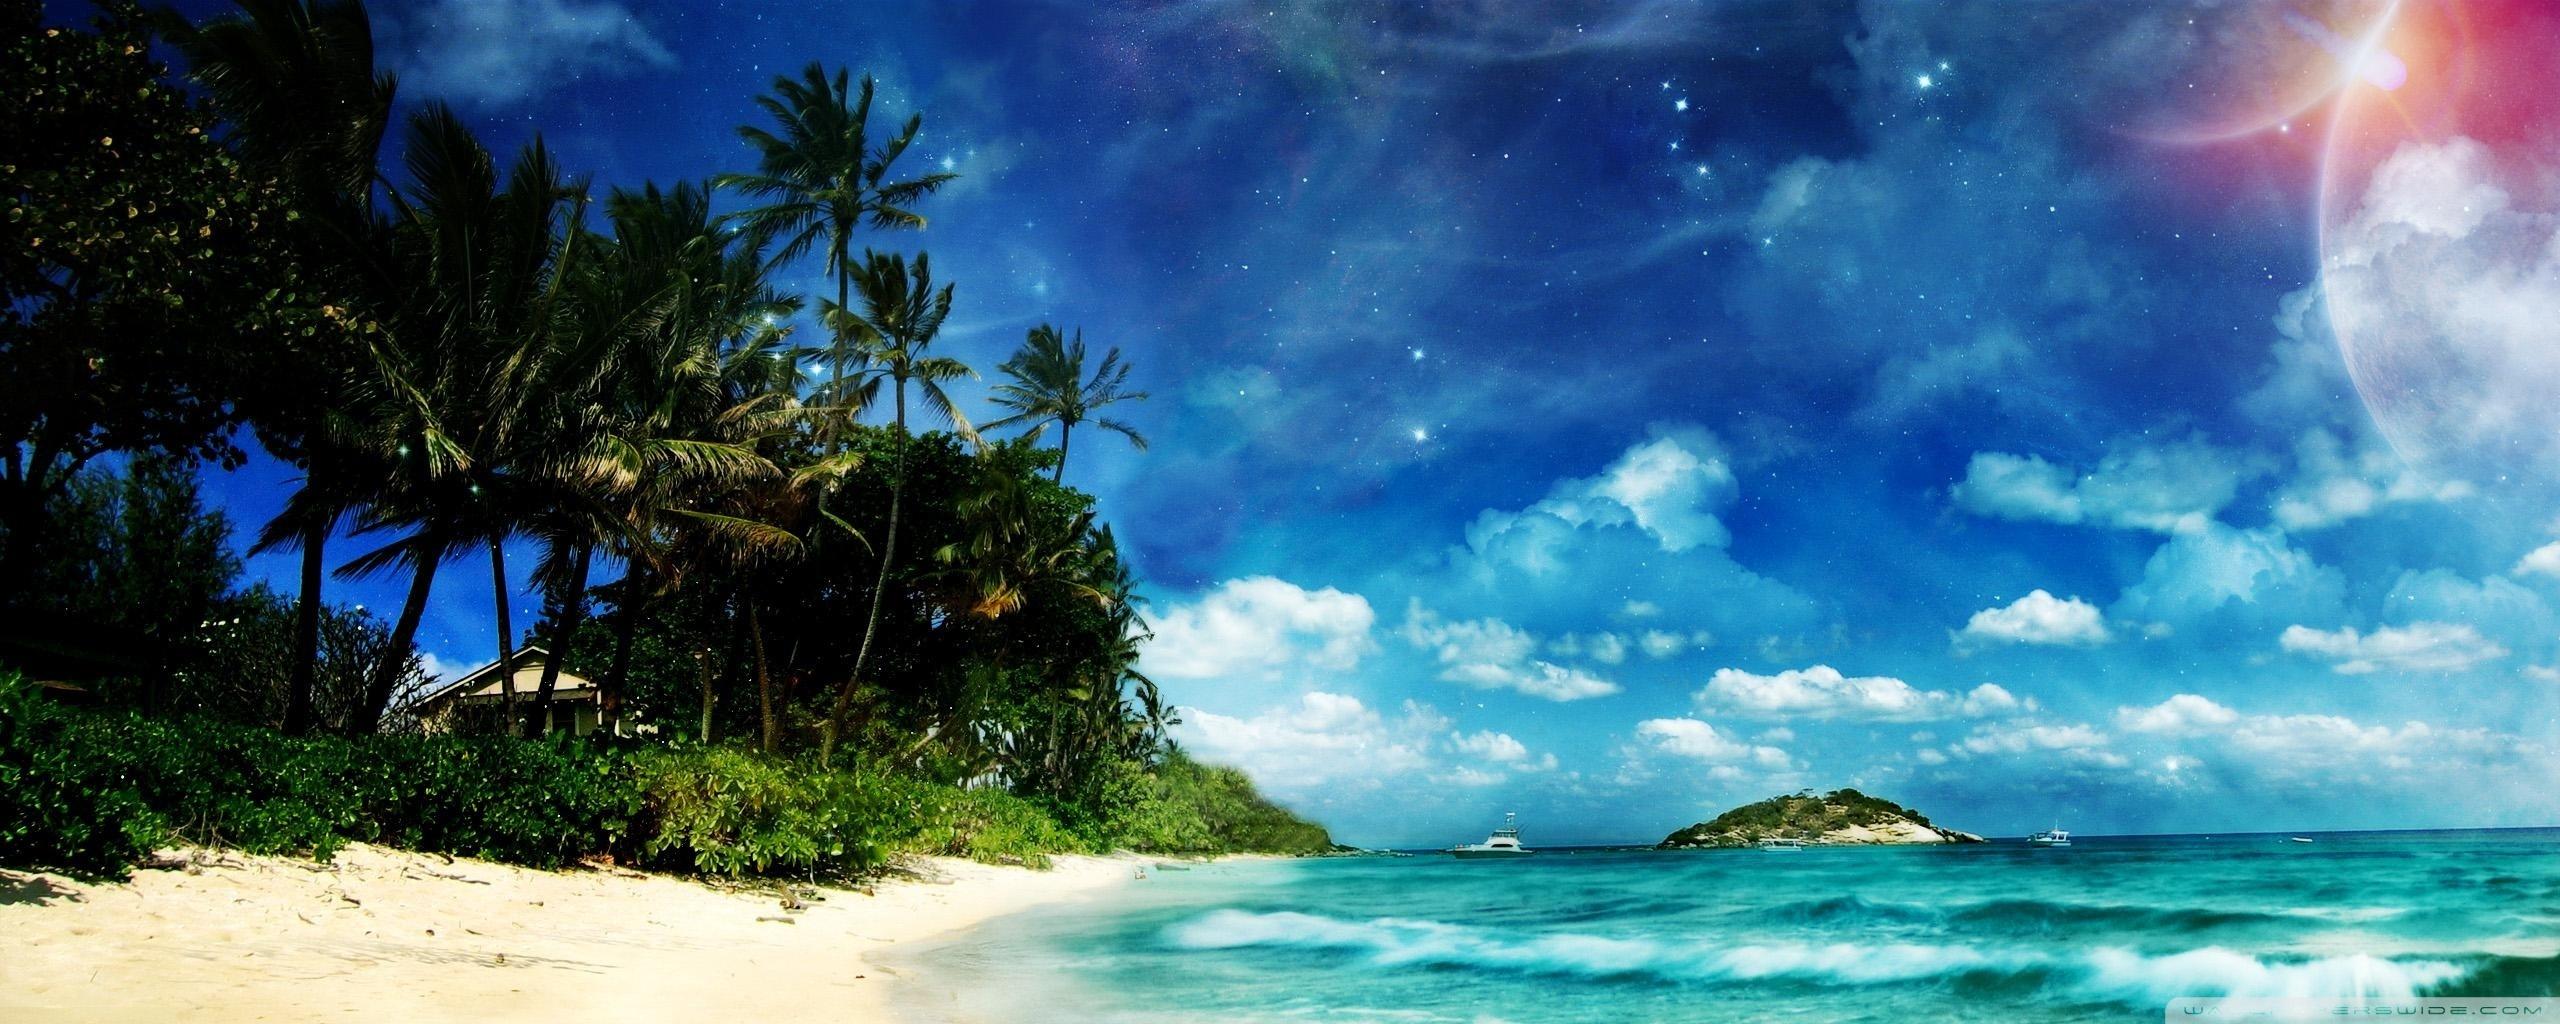 Dual Screen Wallpaper 4k Beach 2560x1024 Wallpaper Teahub Io